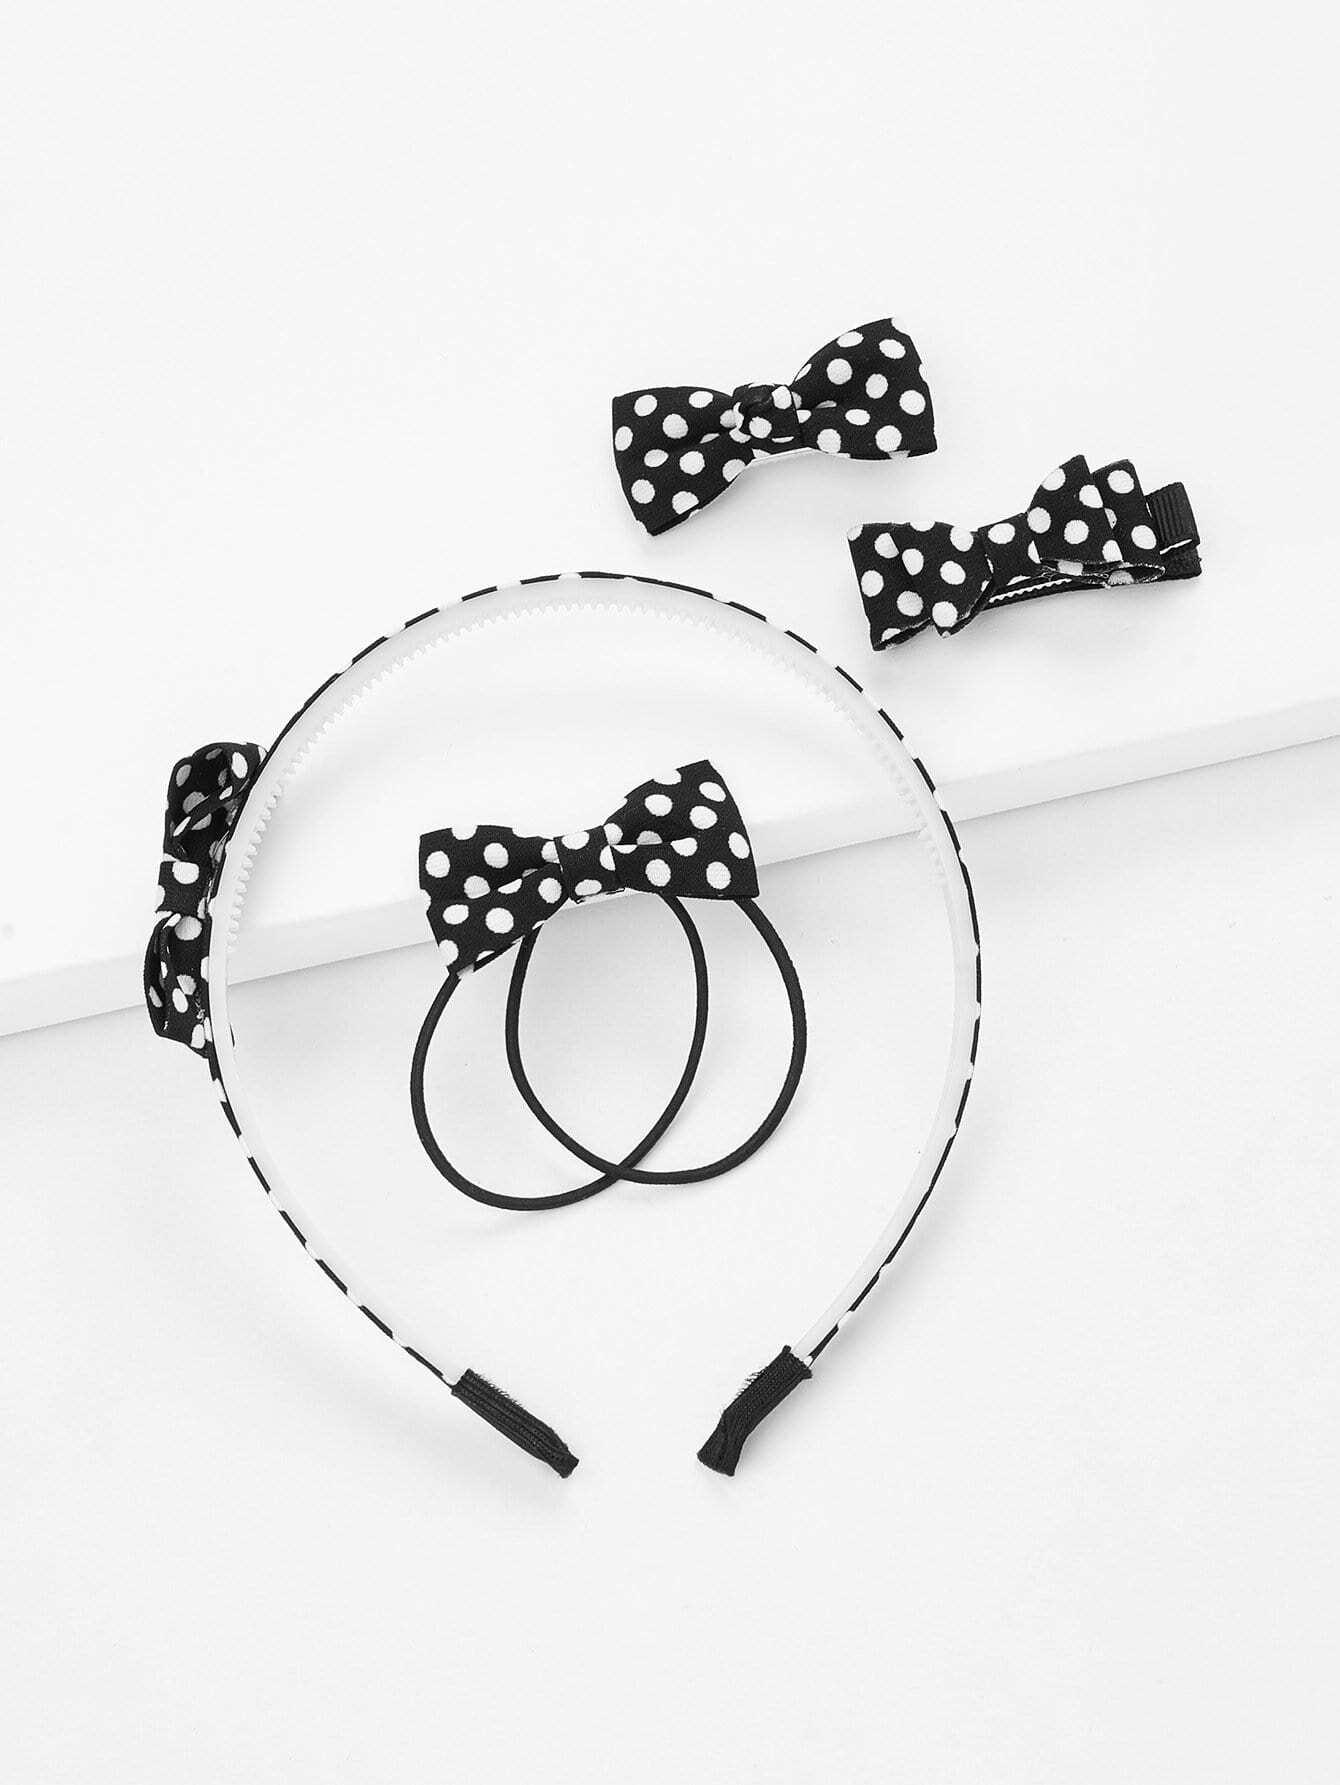 Polka Dot Bow Hair Accessories 5pcs 10pcs fashion girls hair band polka dot bow rabbit ears elastic hair rubber ponytail holder hair accessories for women headband